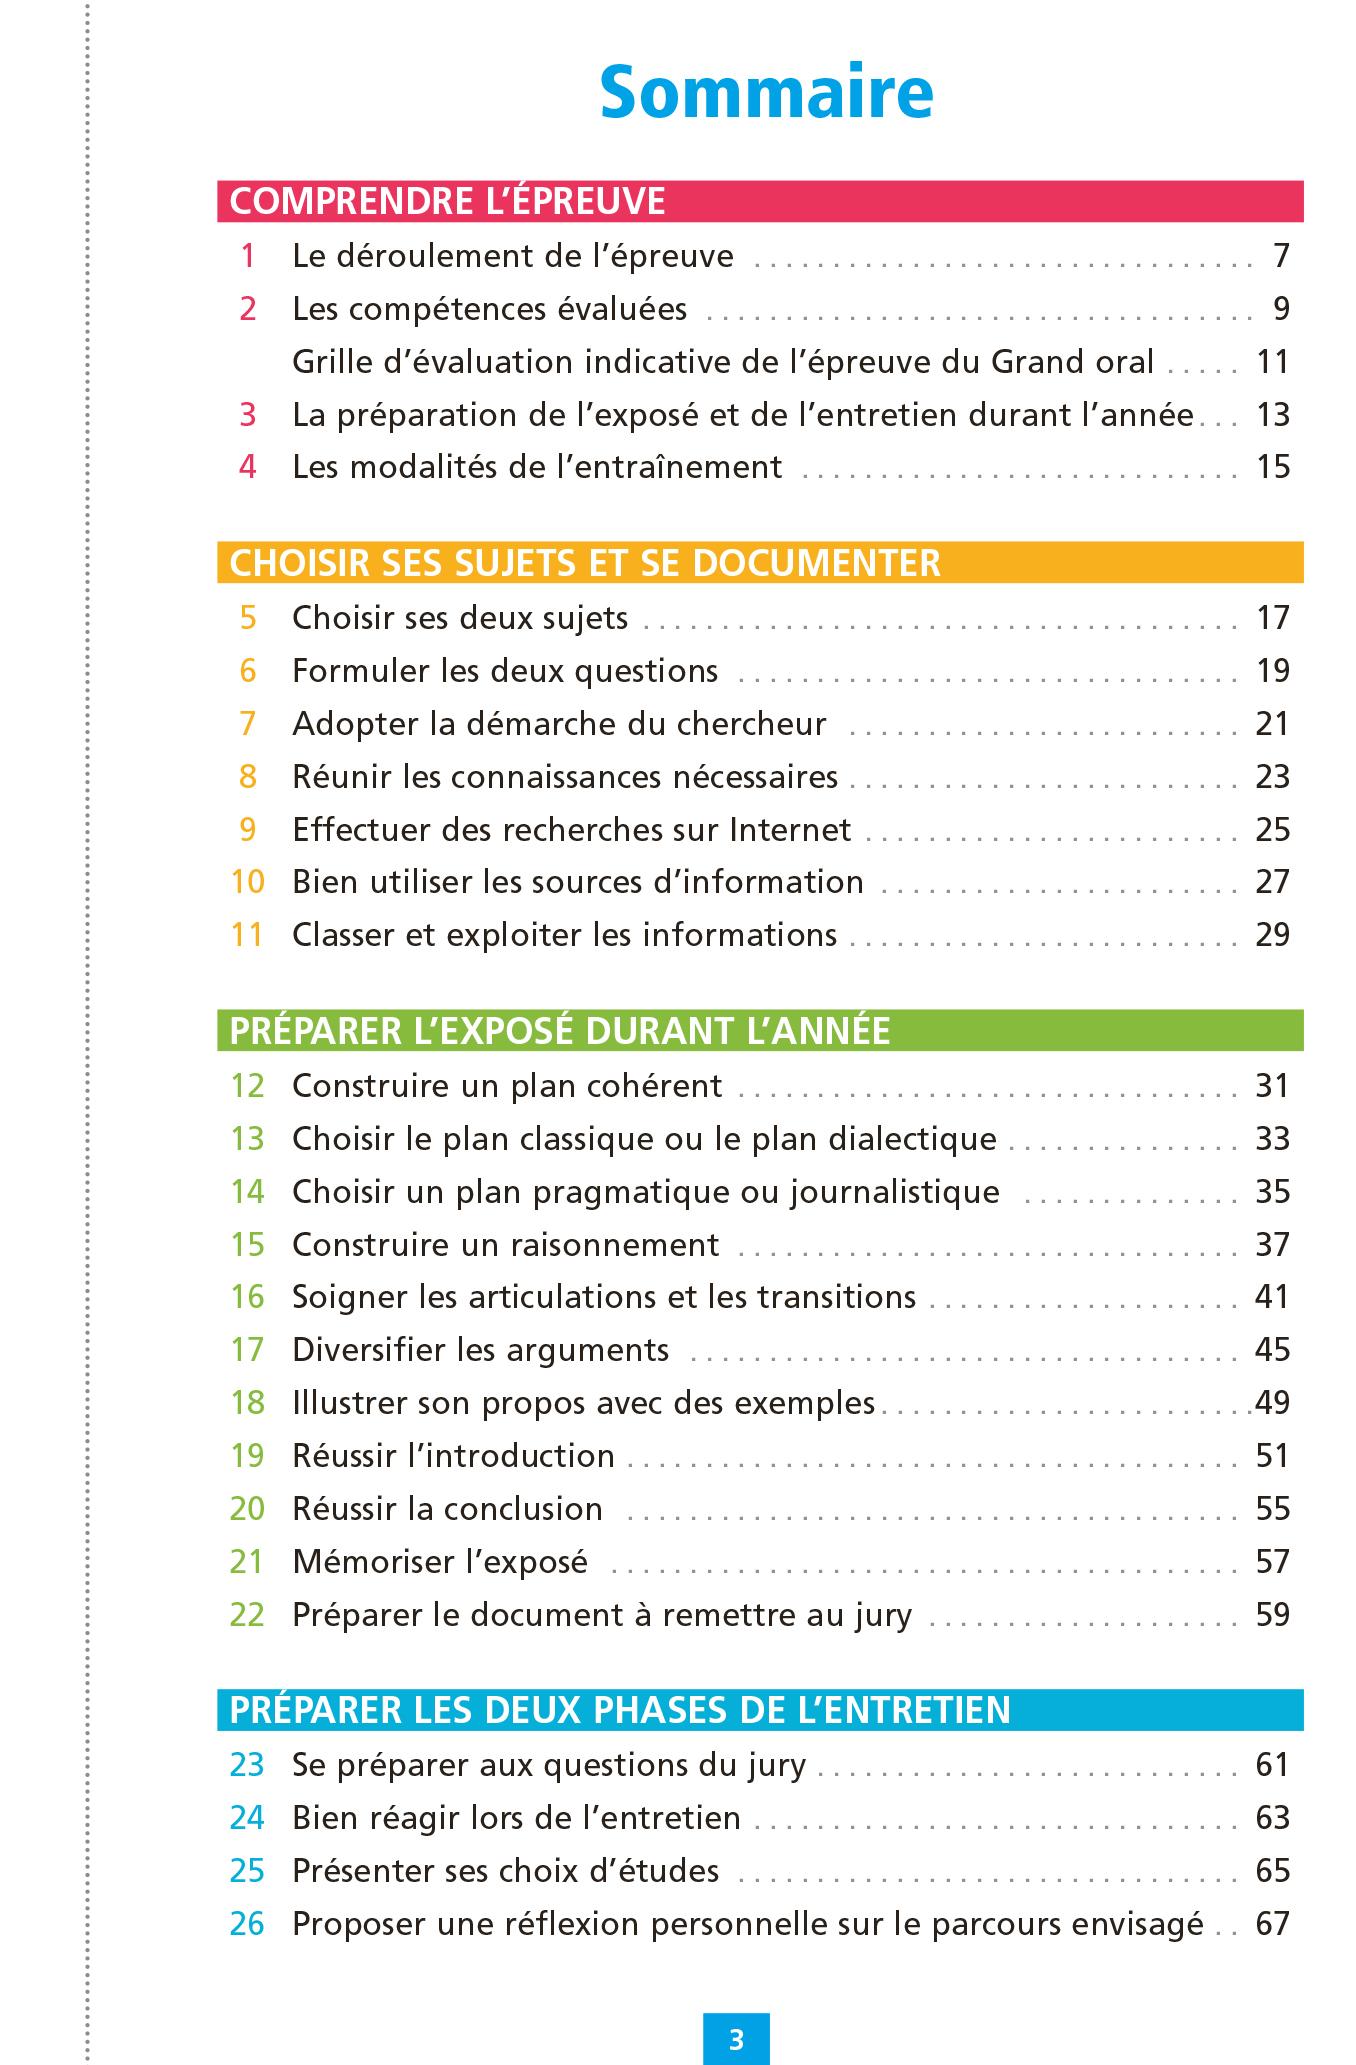 Objectif BAC - Fiches Grand oral du Bac   Hachette ...